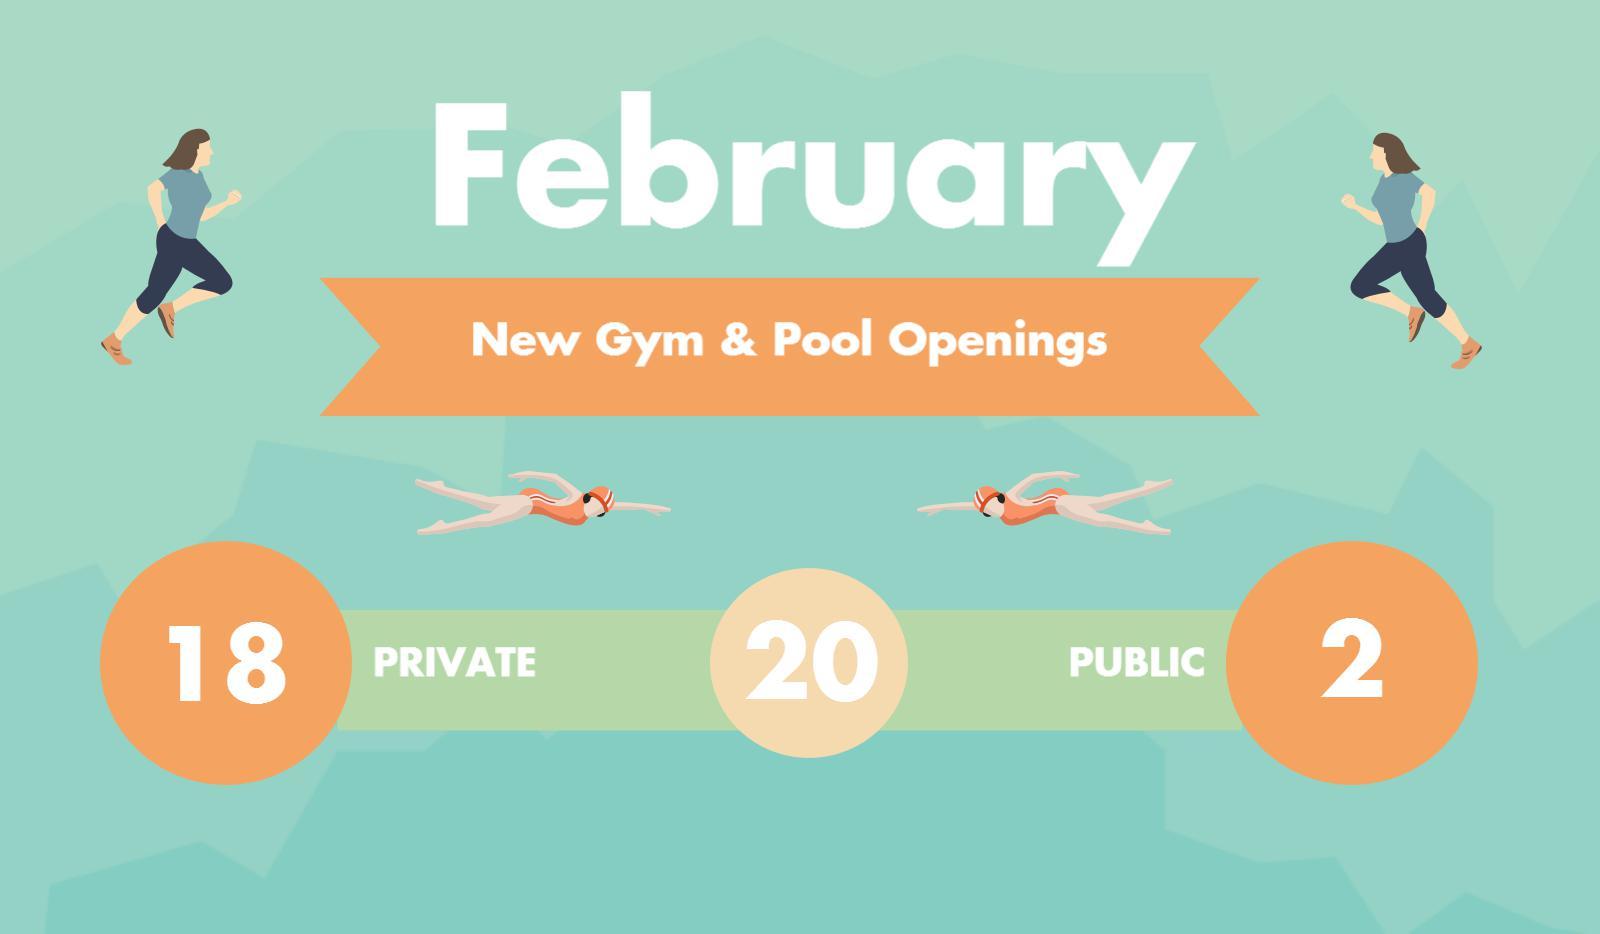 feb-2016-new-openings (3).jpeg